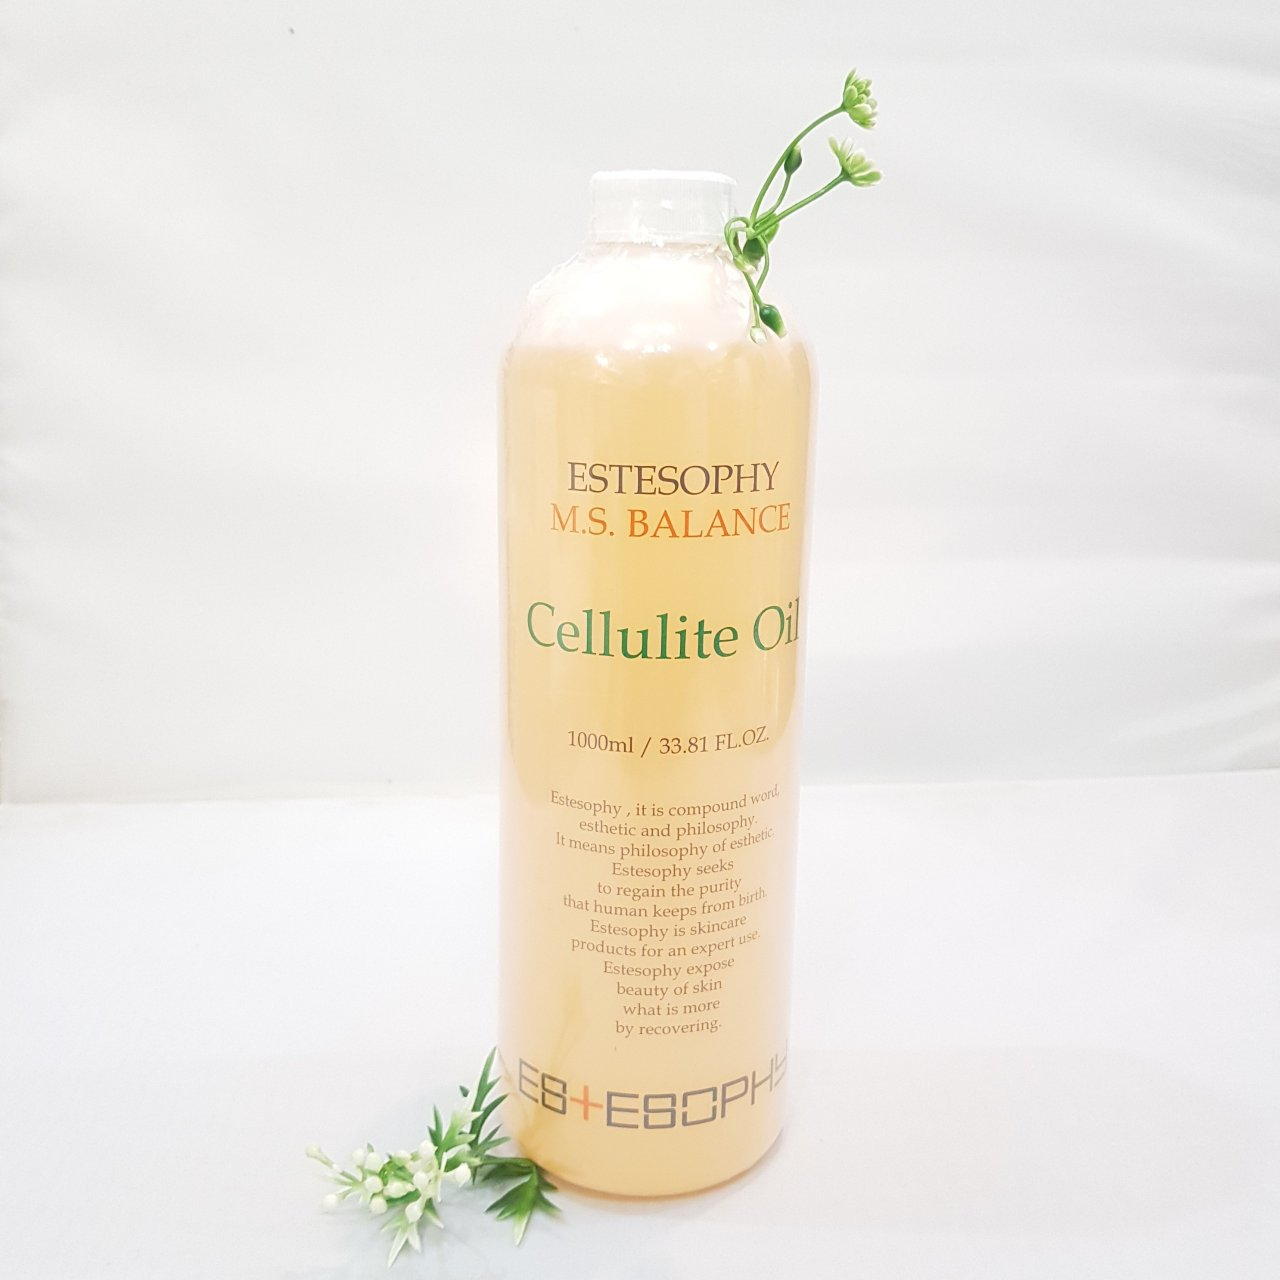 hinh-dau-massage-pha-mo-duoi-da-cellulite-oil